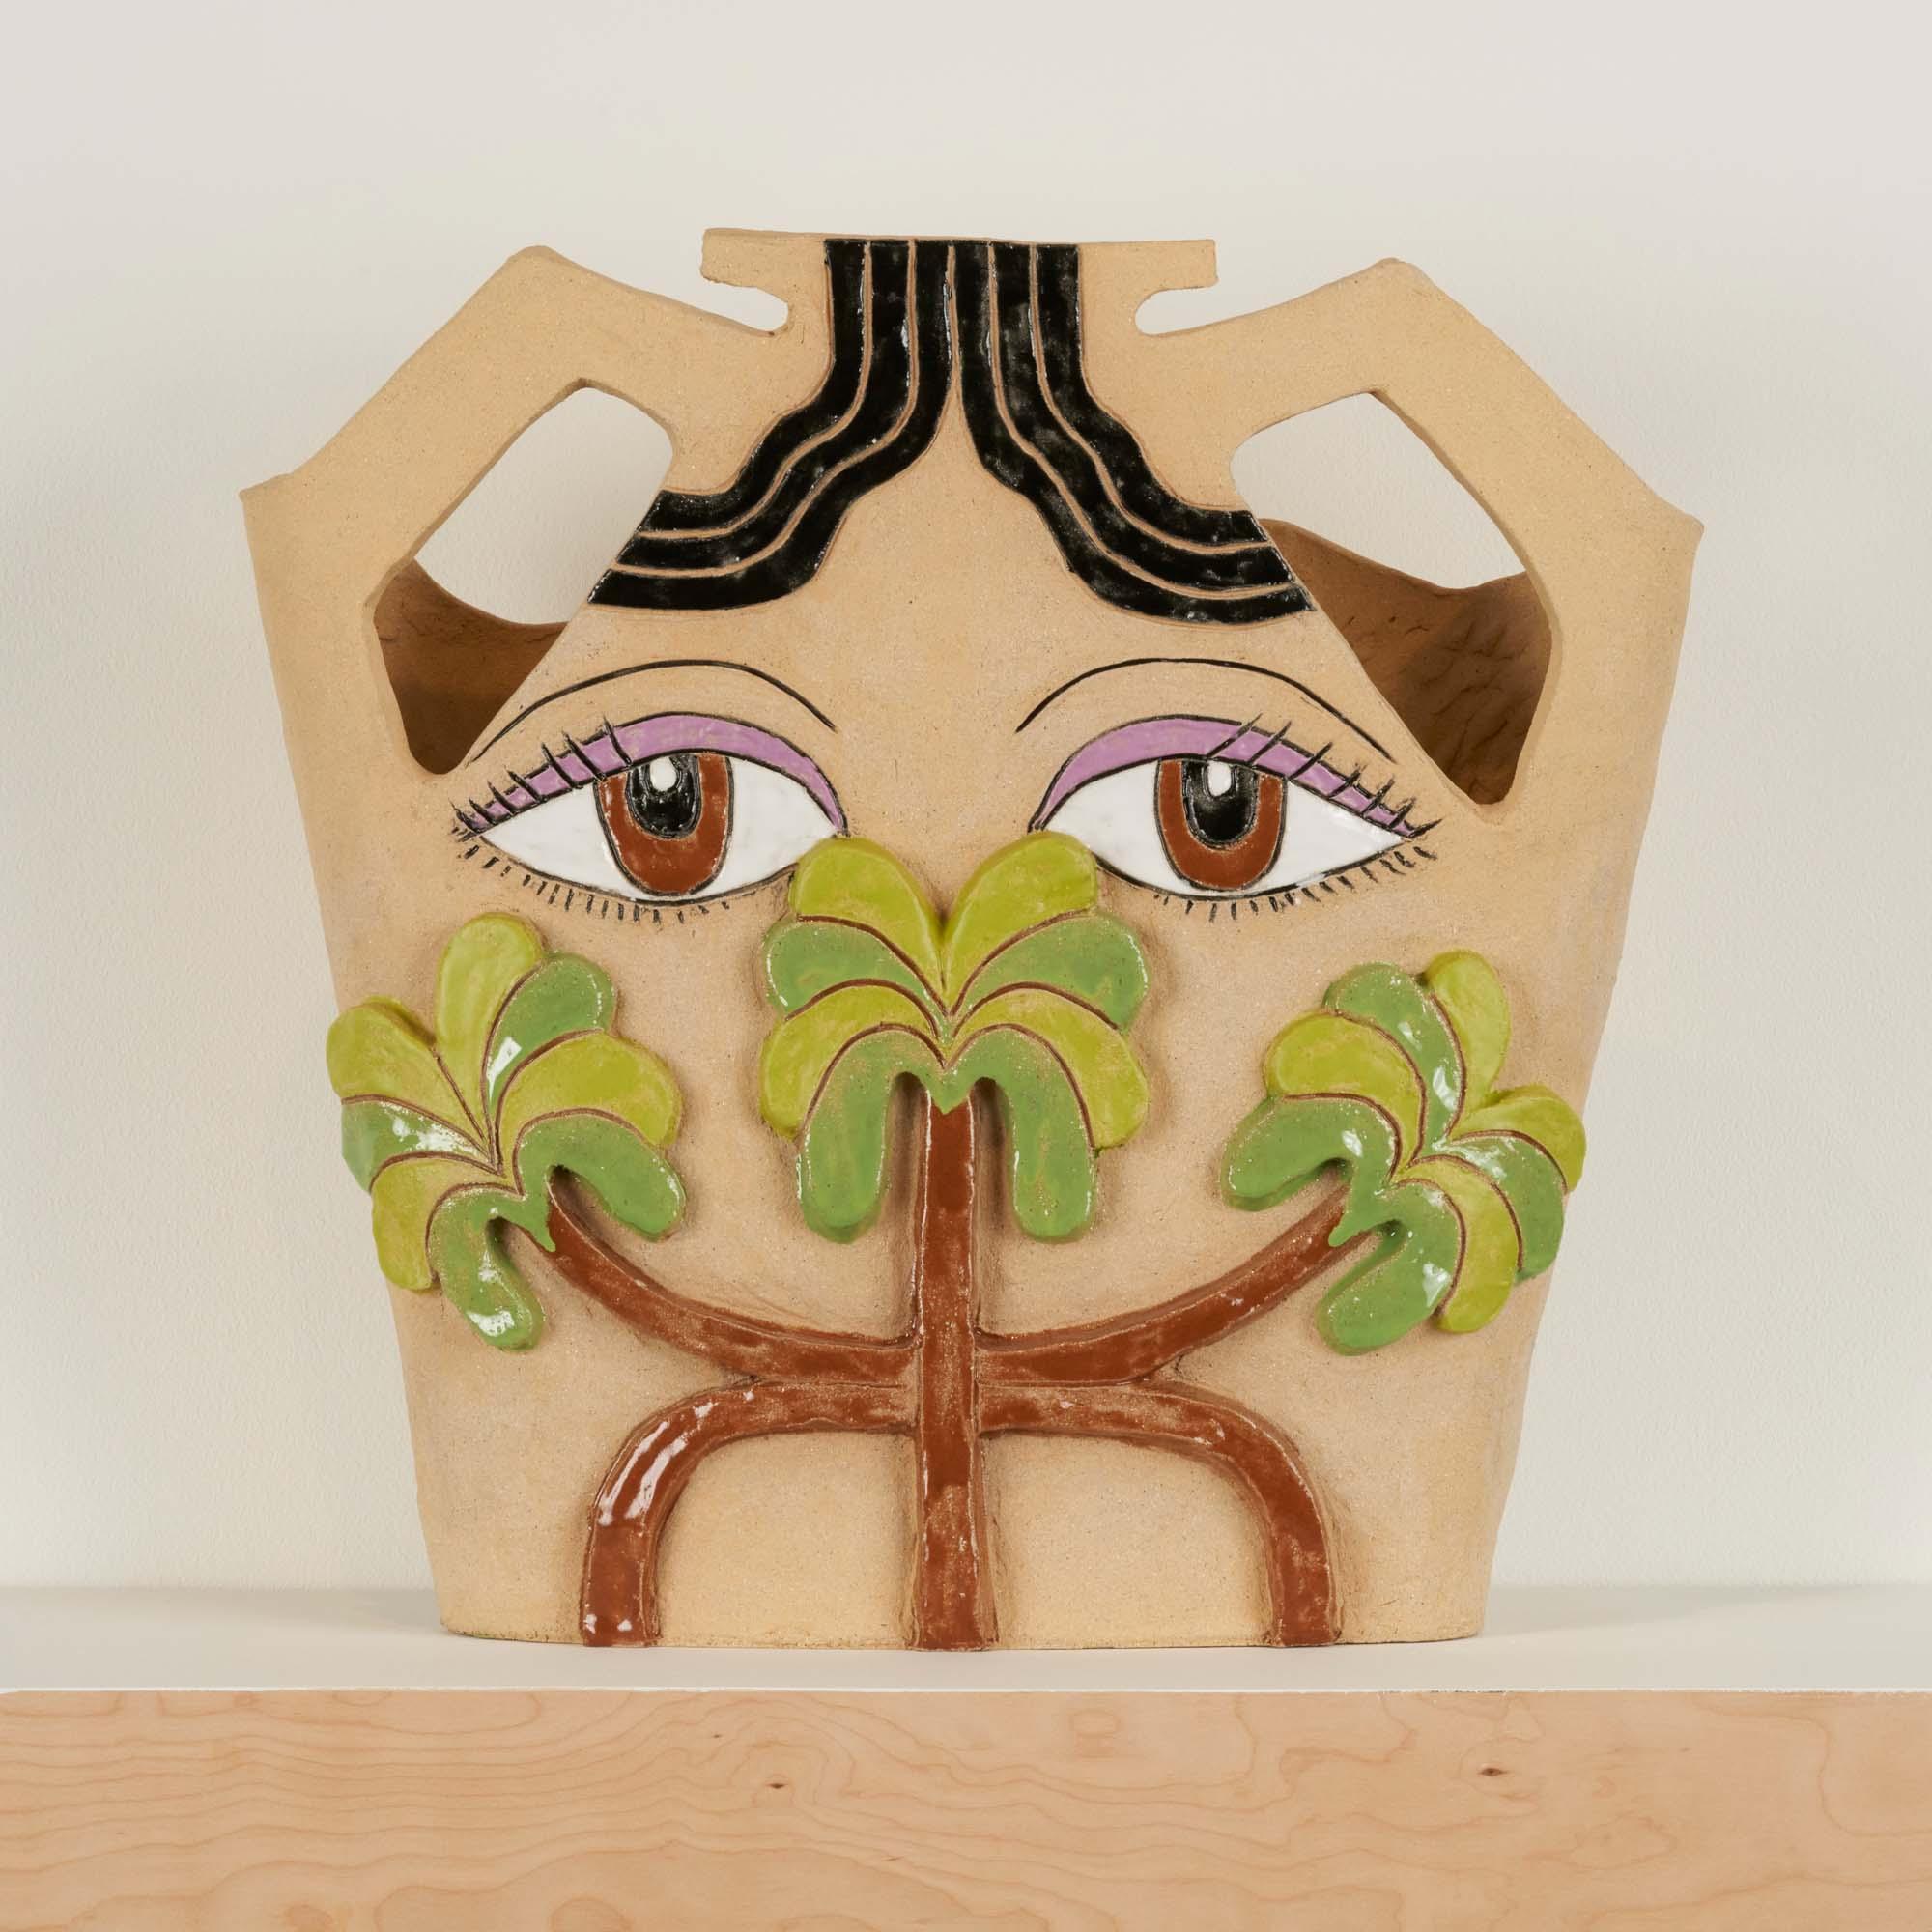 "Image of ceramic vessel on wall shelf, titled ""Puabi Palms Pot"" by Maryam Yousif."